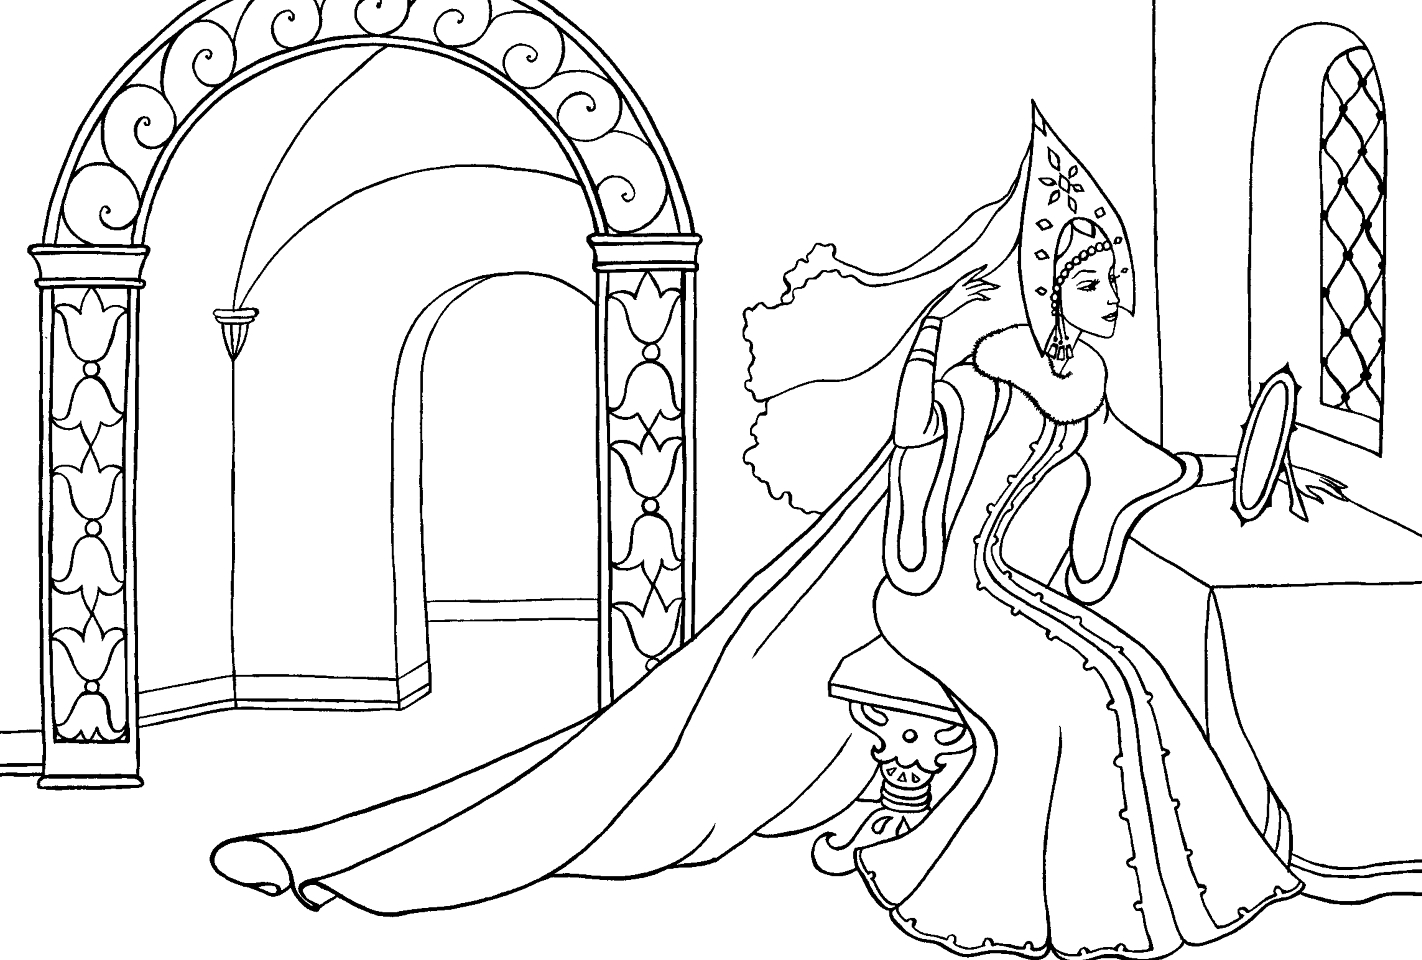 Мёртвая царевна и семь богатырей раскраска